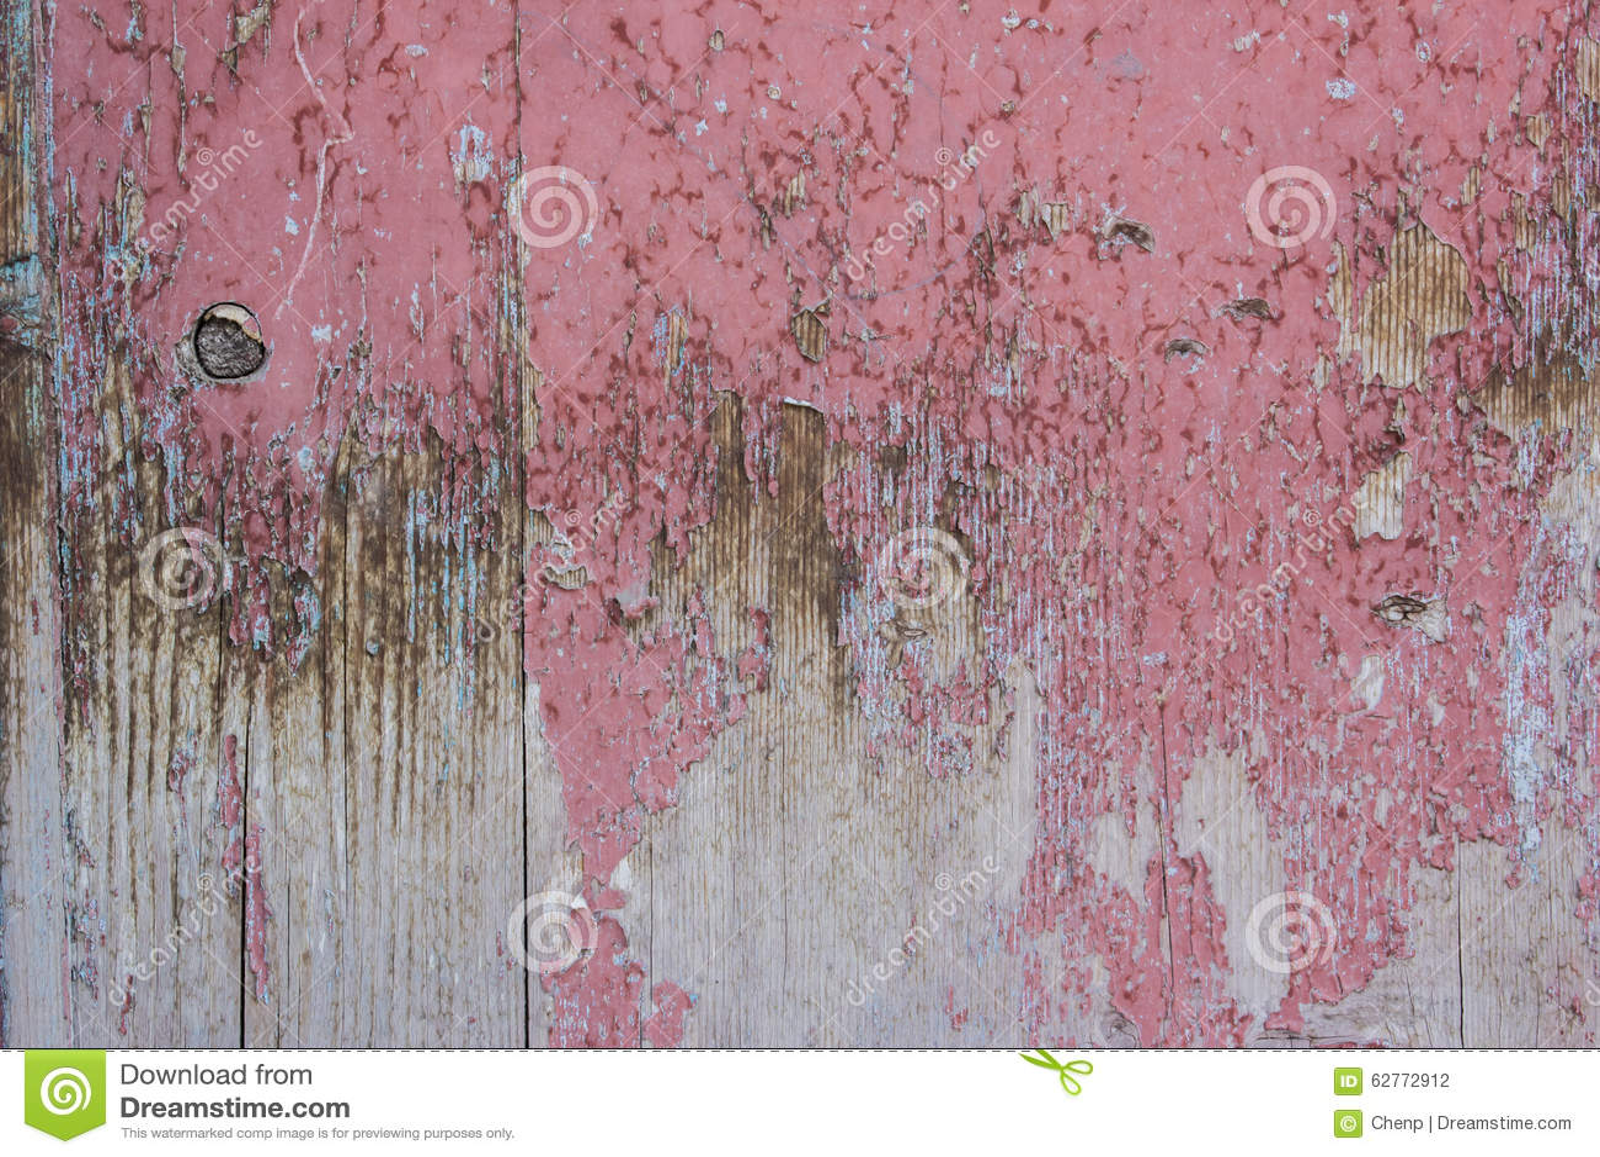 Rote graue farbe gesprenkelte holztüren stockfoto   bild: 62772912